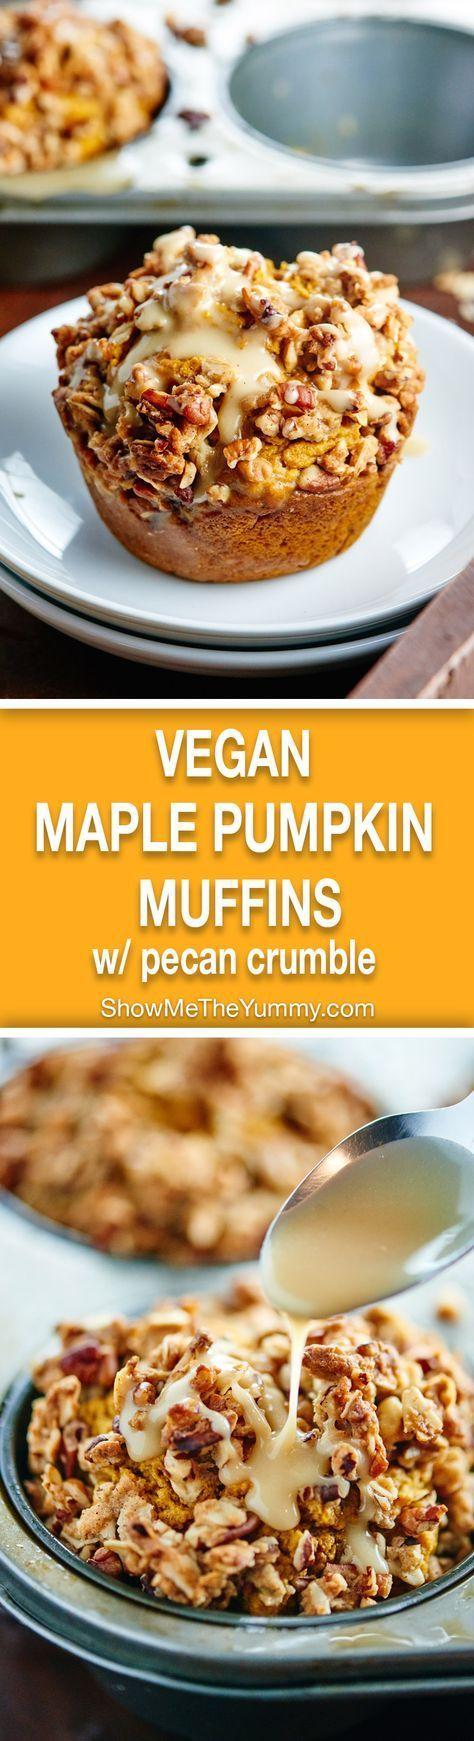 331 best Vegan Halloween images on Pinterest